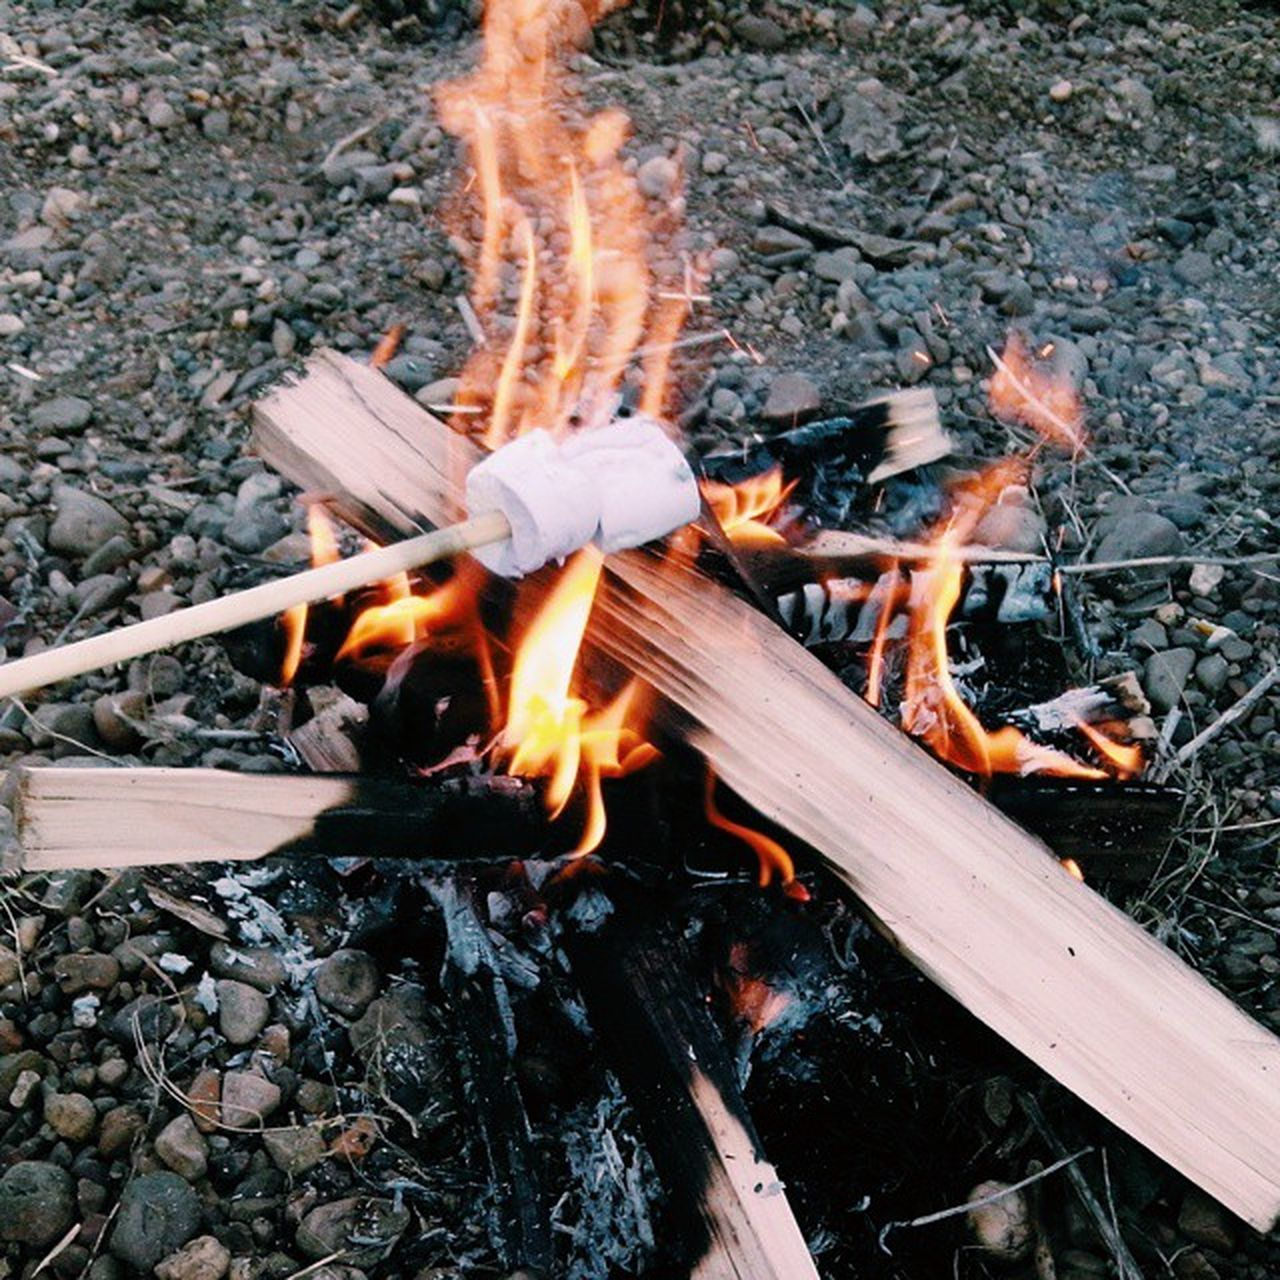 костер маршмеллоу  Природа Nature Fair огонь Лето 2015 Еда зефир Orange Color пламя языки пламяни бревна Вкусняшка First Eyeem Photo